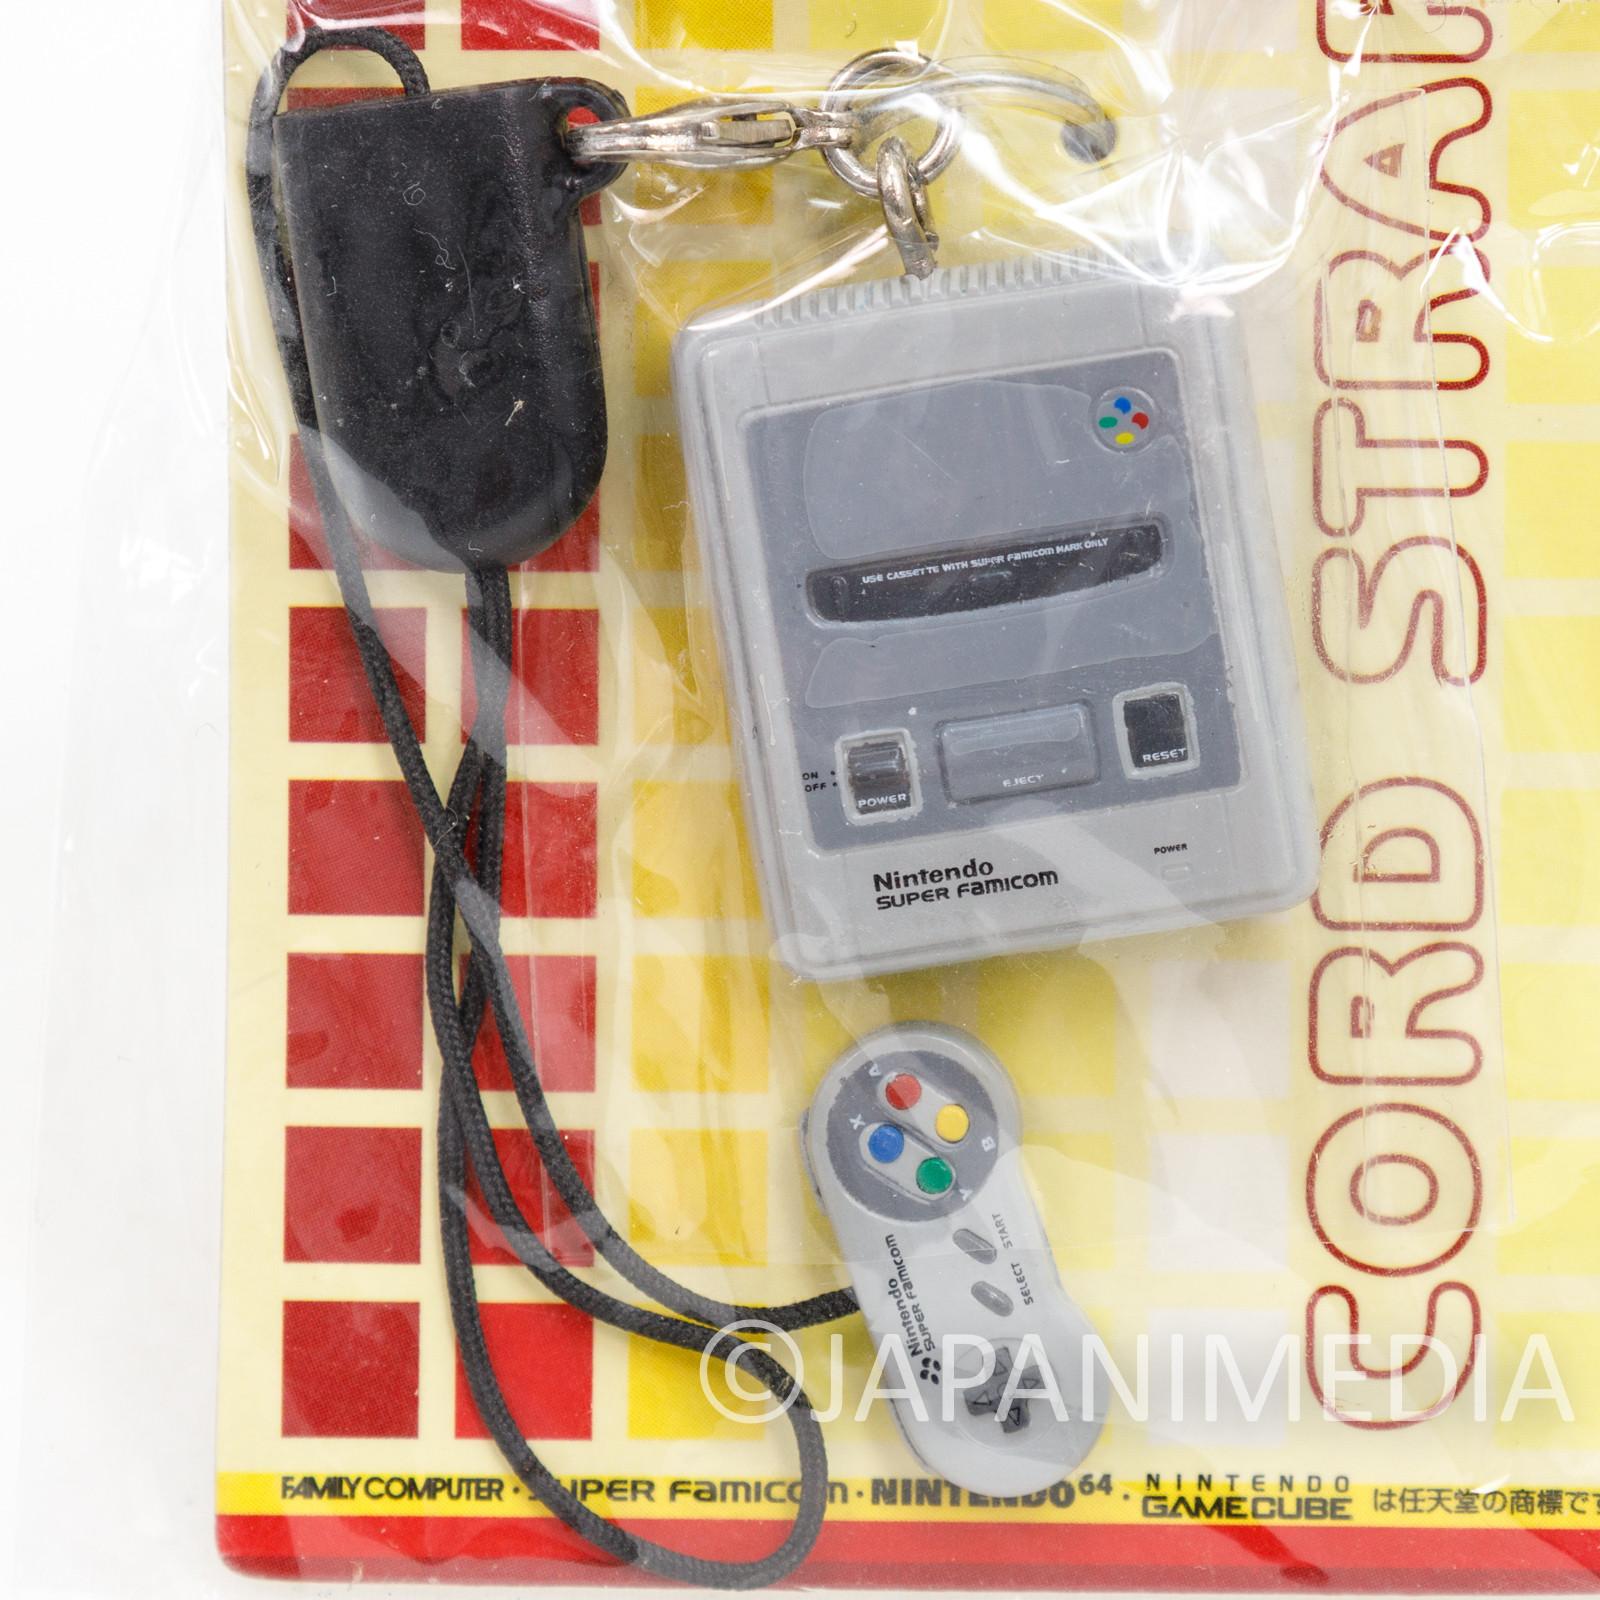 Nintendo Game Console Miniature Figure Strap Super Famicom SNES